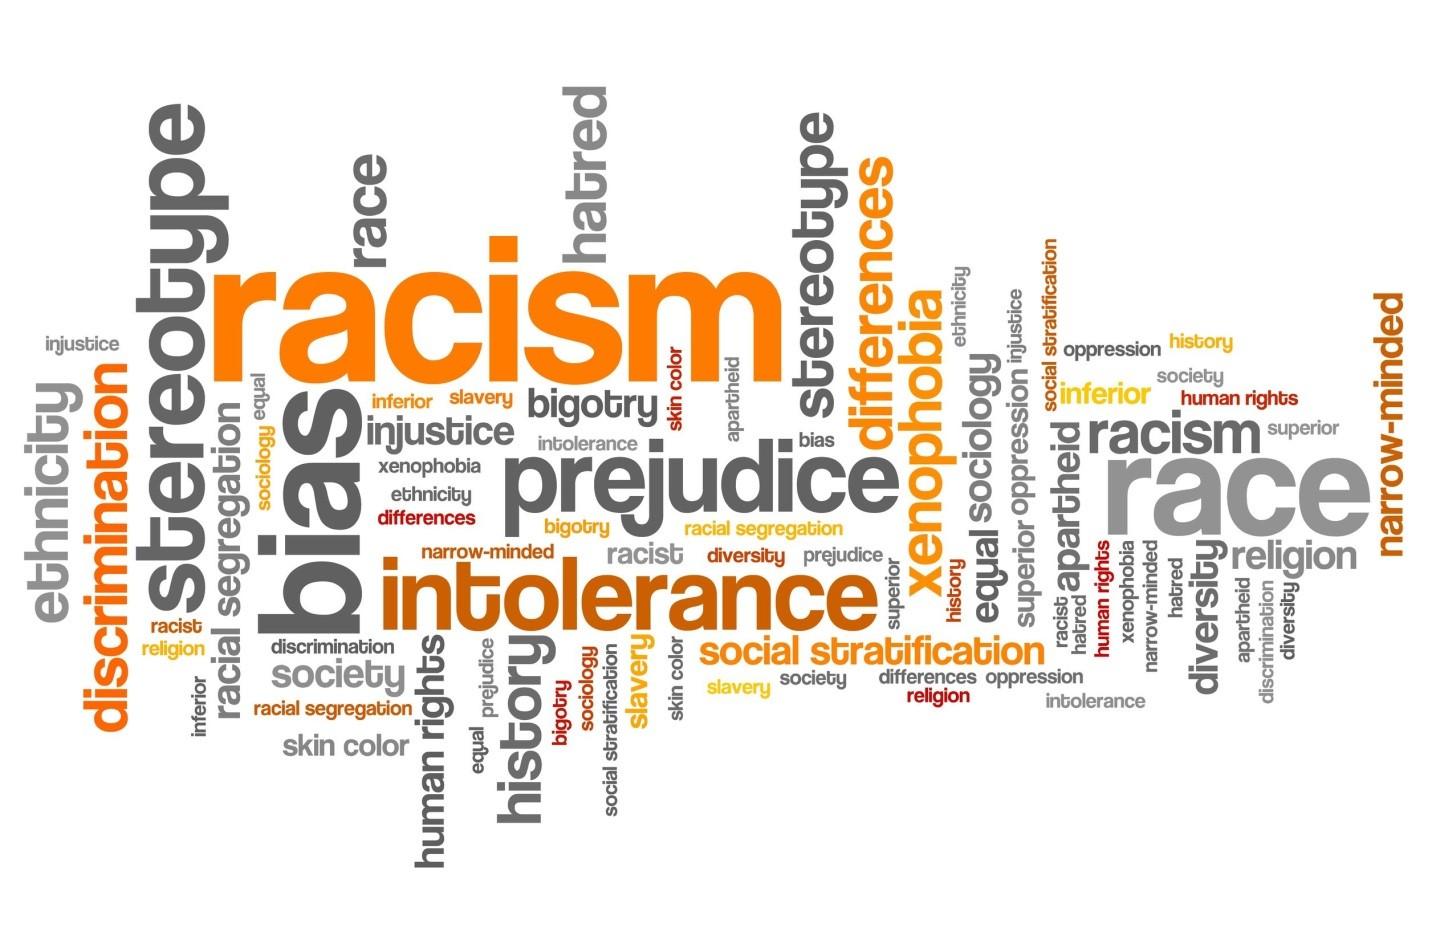 #Nohatespeech. Raccontare l'estremismo senza istigarlo